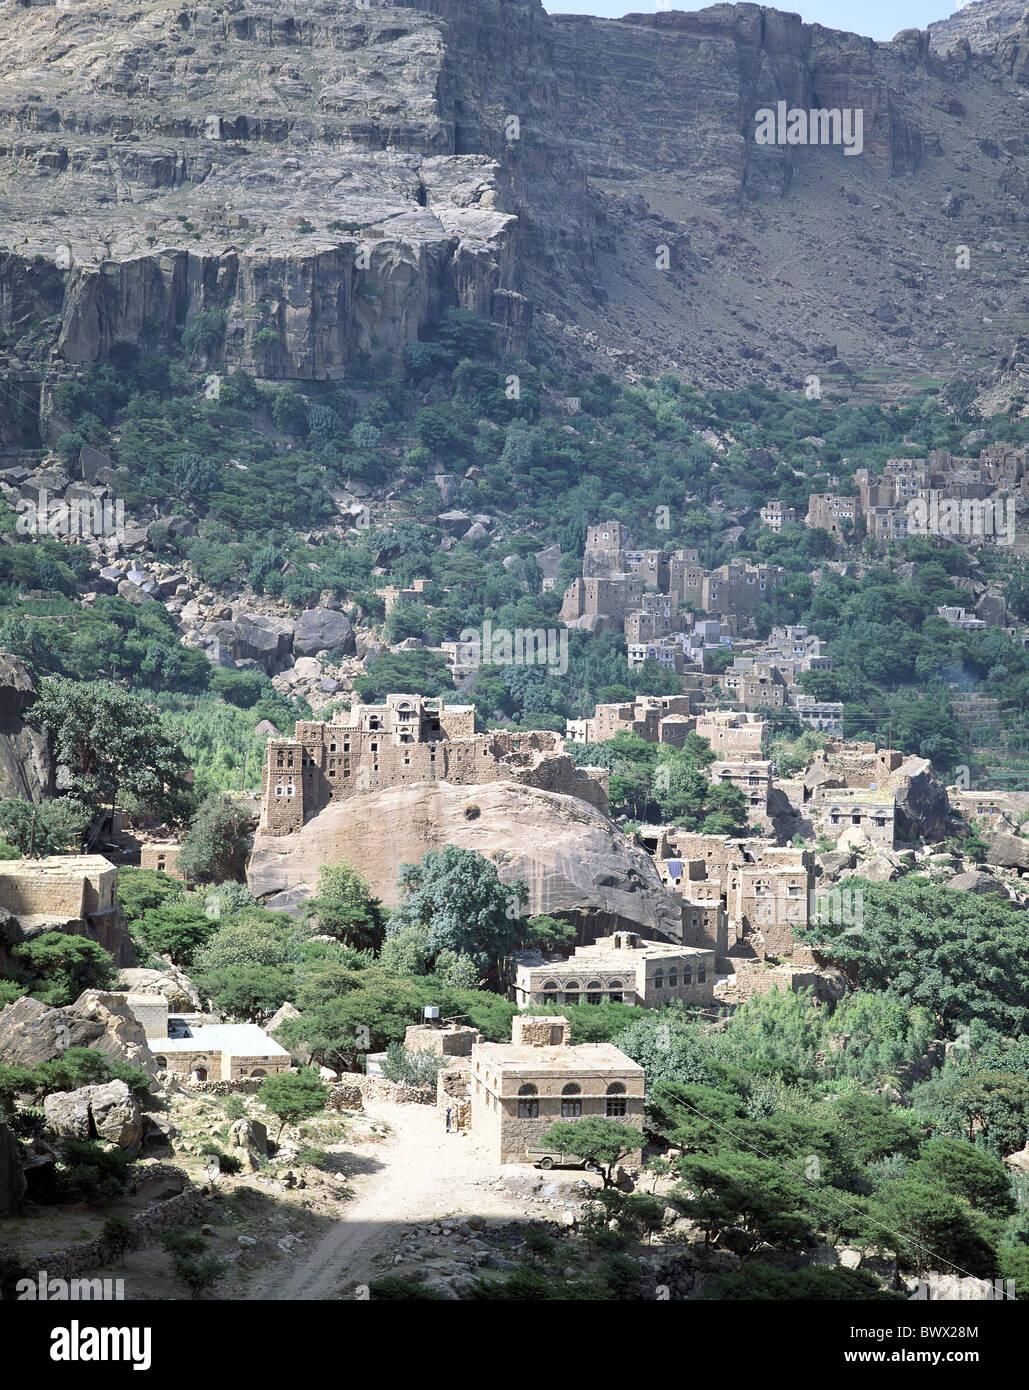 village Rocky Mountains Yemen Middle East scenery Shihara vegetation - Stock Image